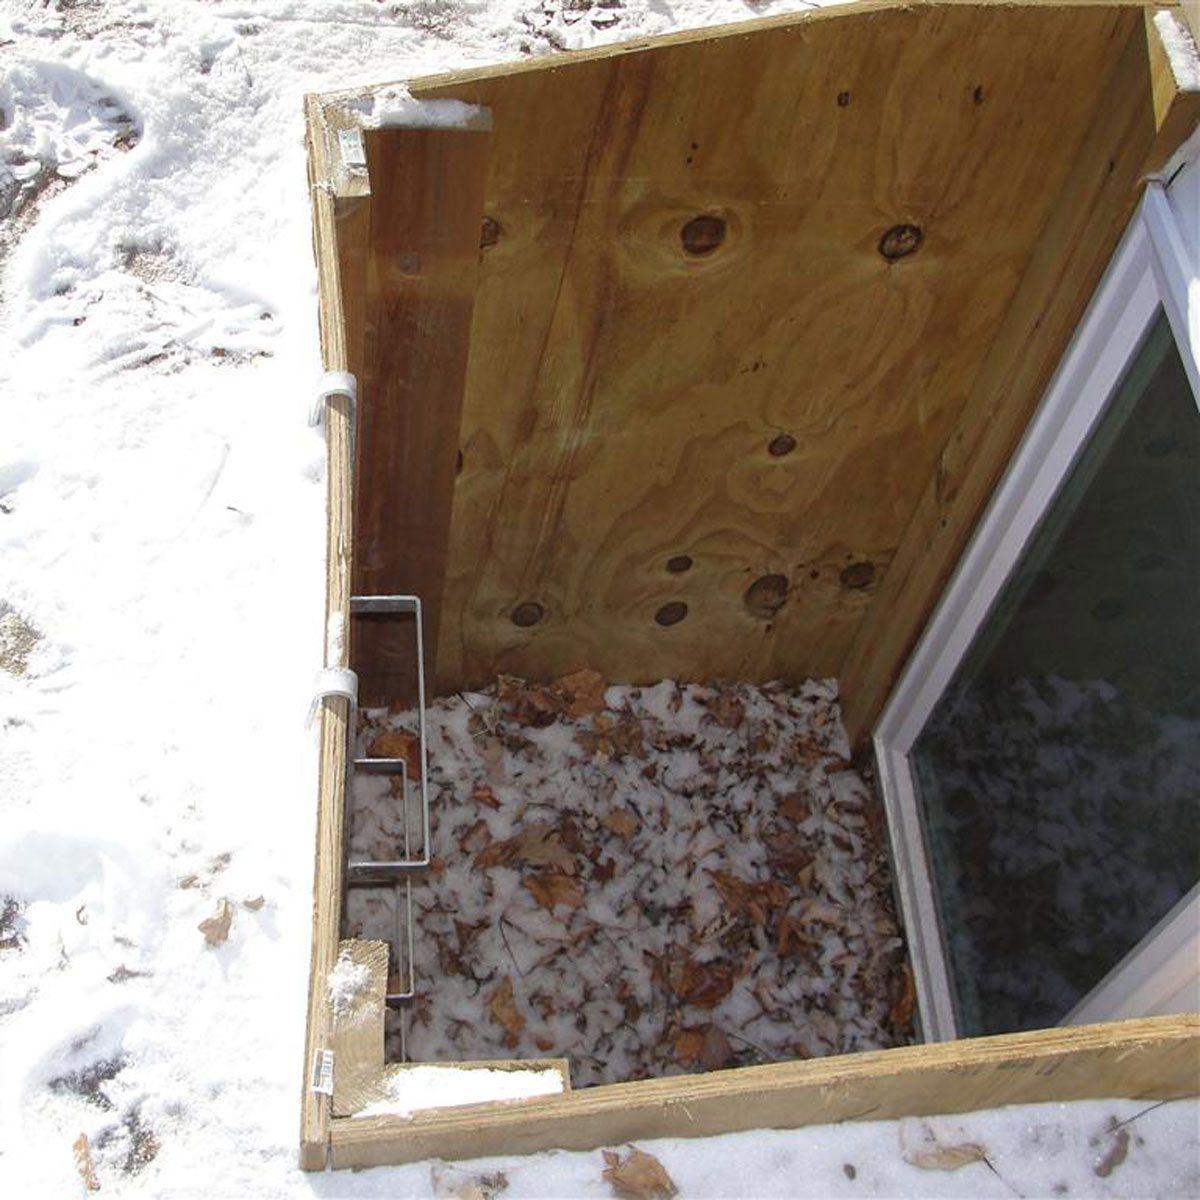 Plywood window well